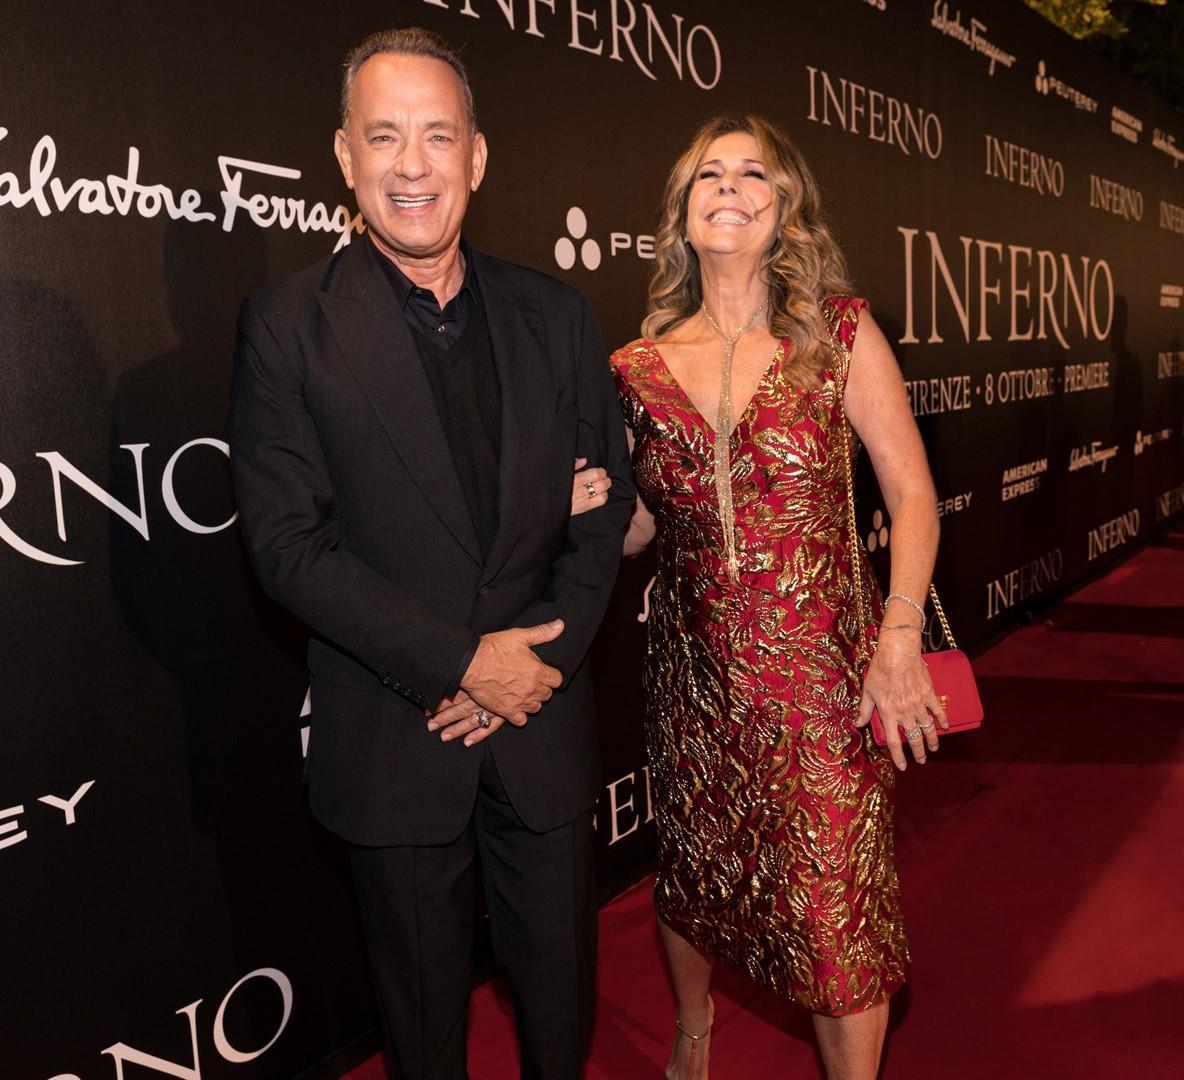 Tom Hanks e la moglie Rita Wilson a Firenze